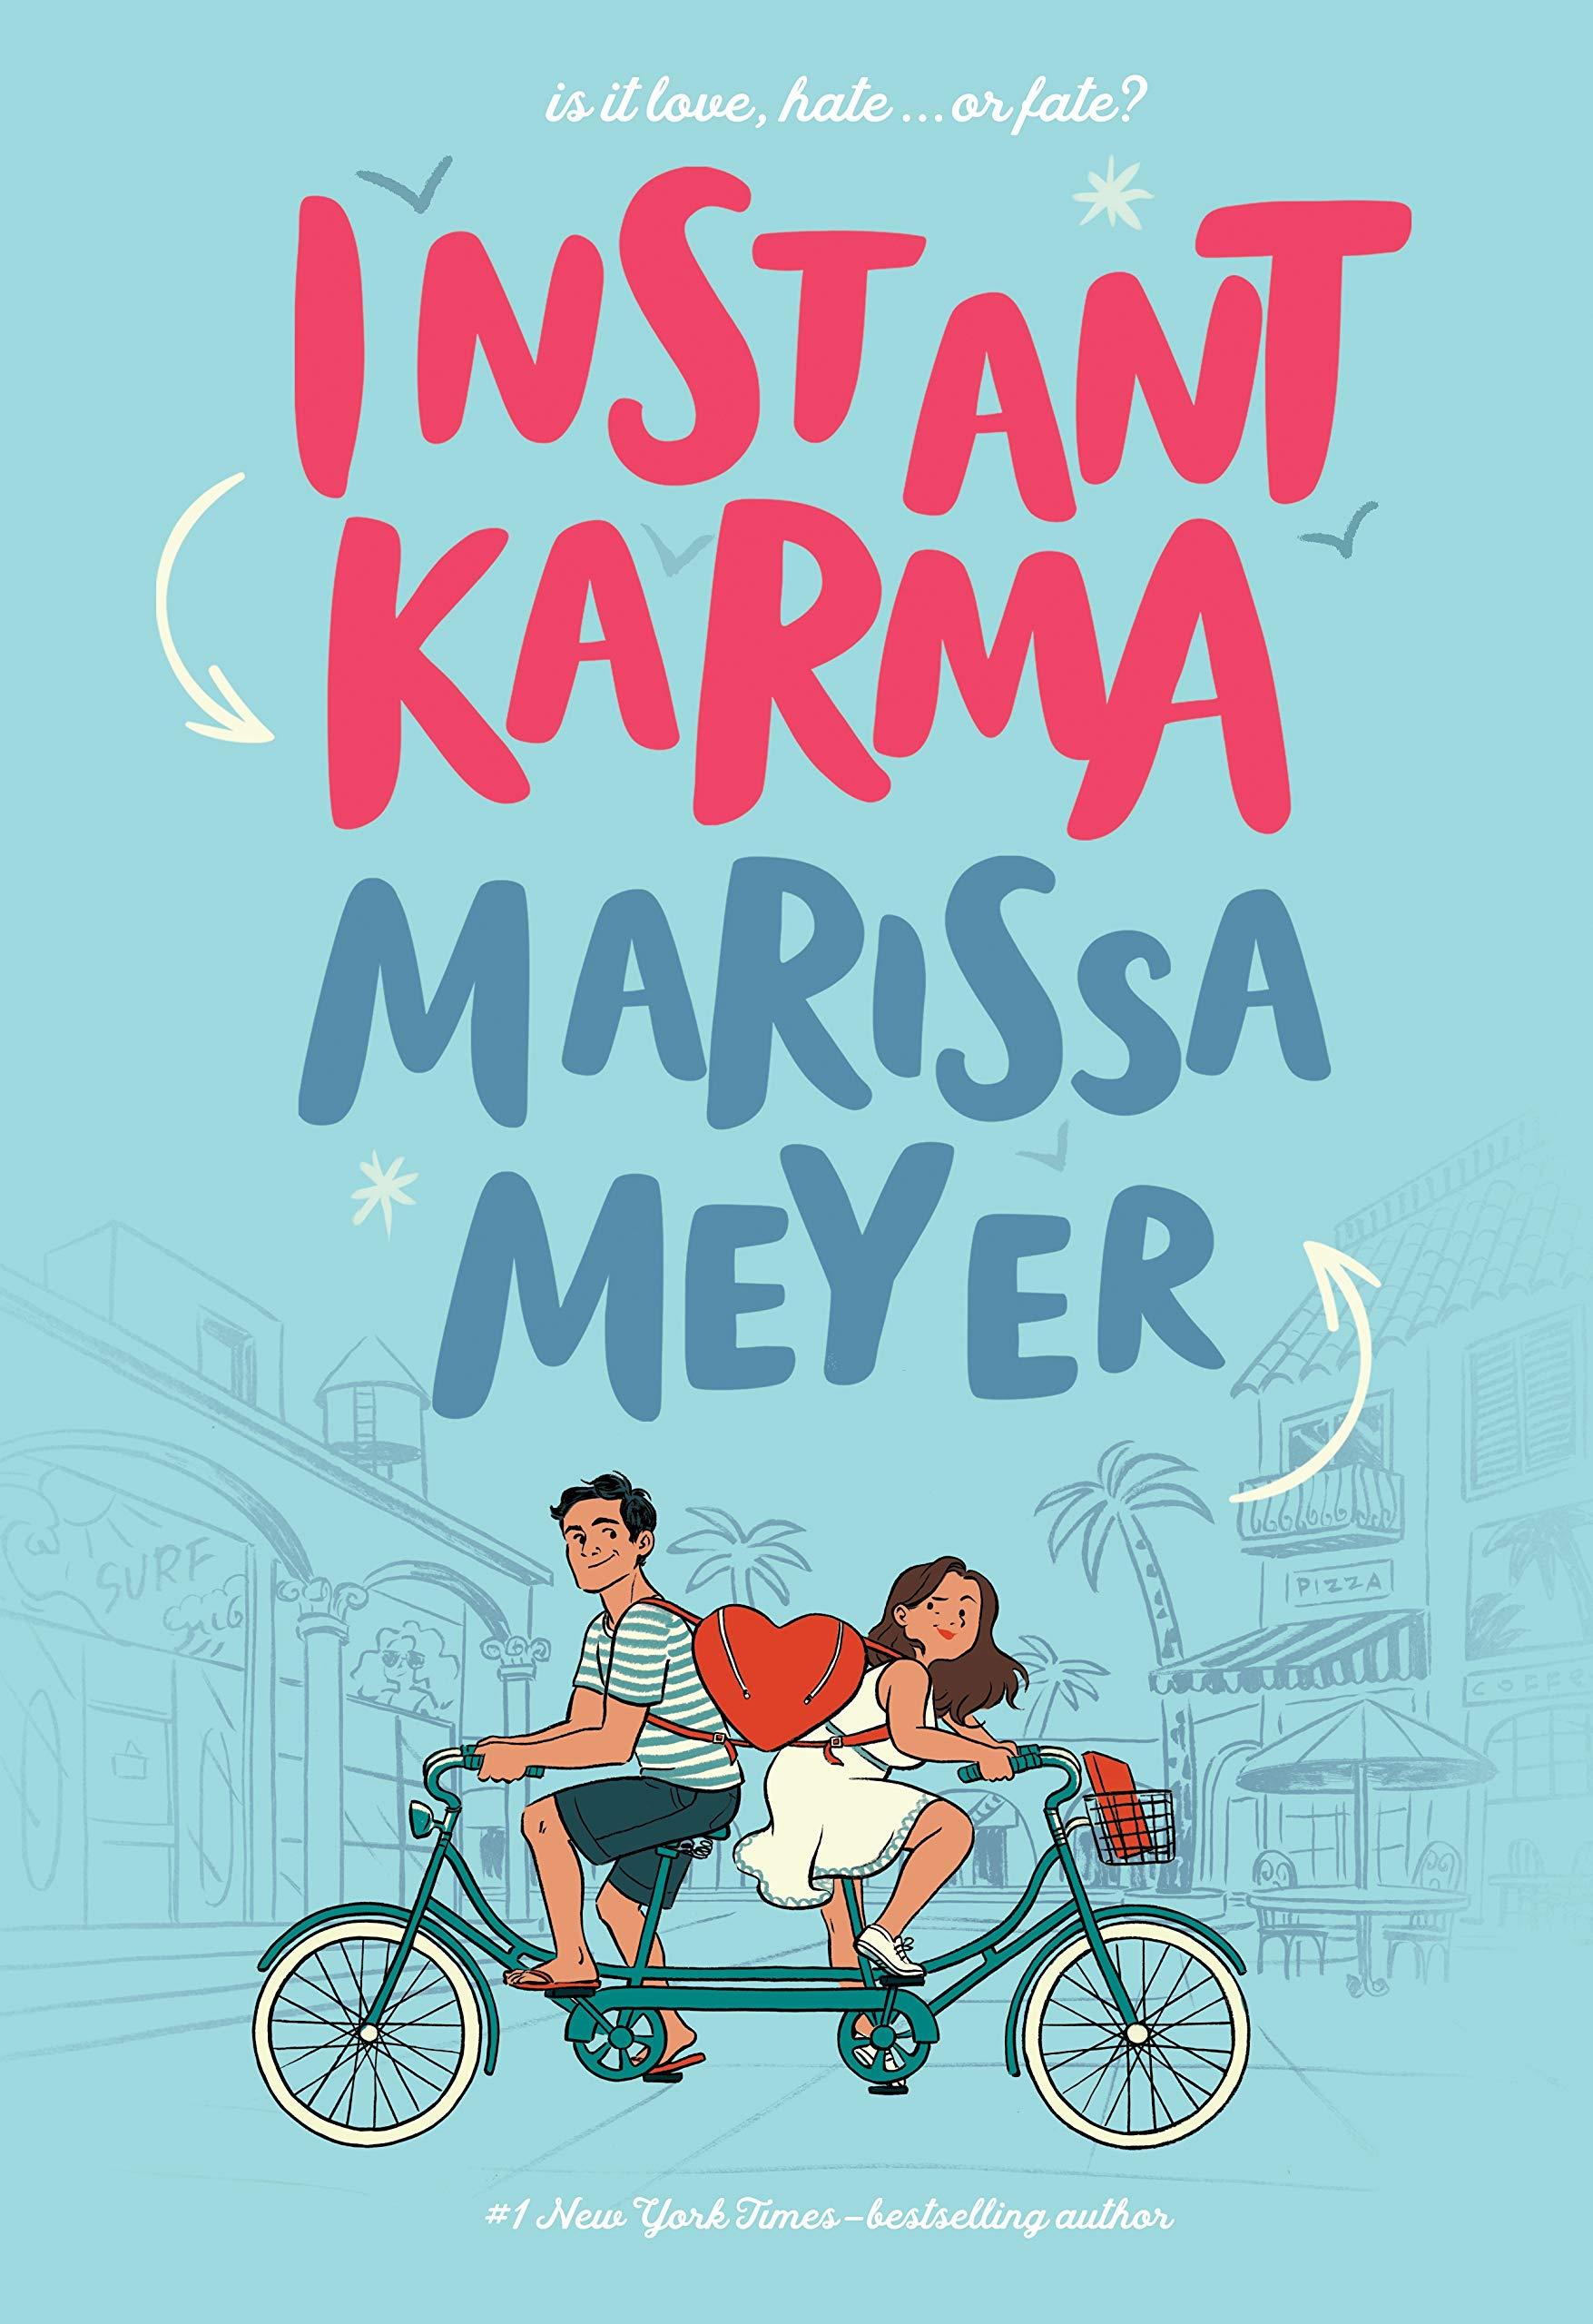 Amazon.com: Instant Karma (9781250618818): Meyer, Marissa: Books